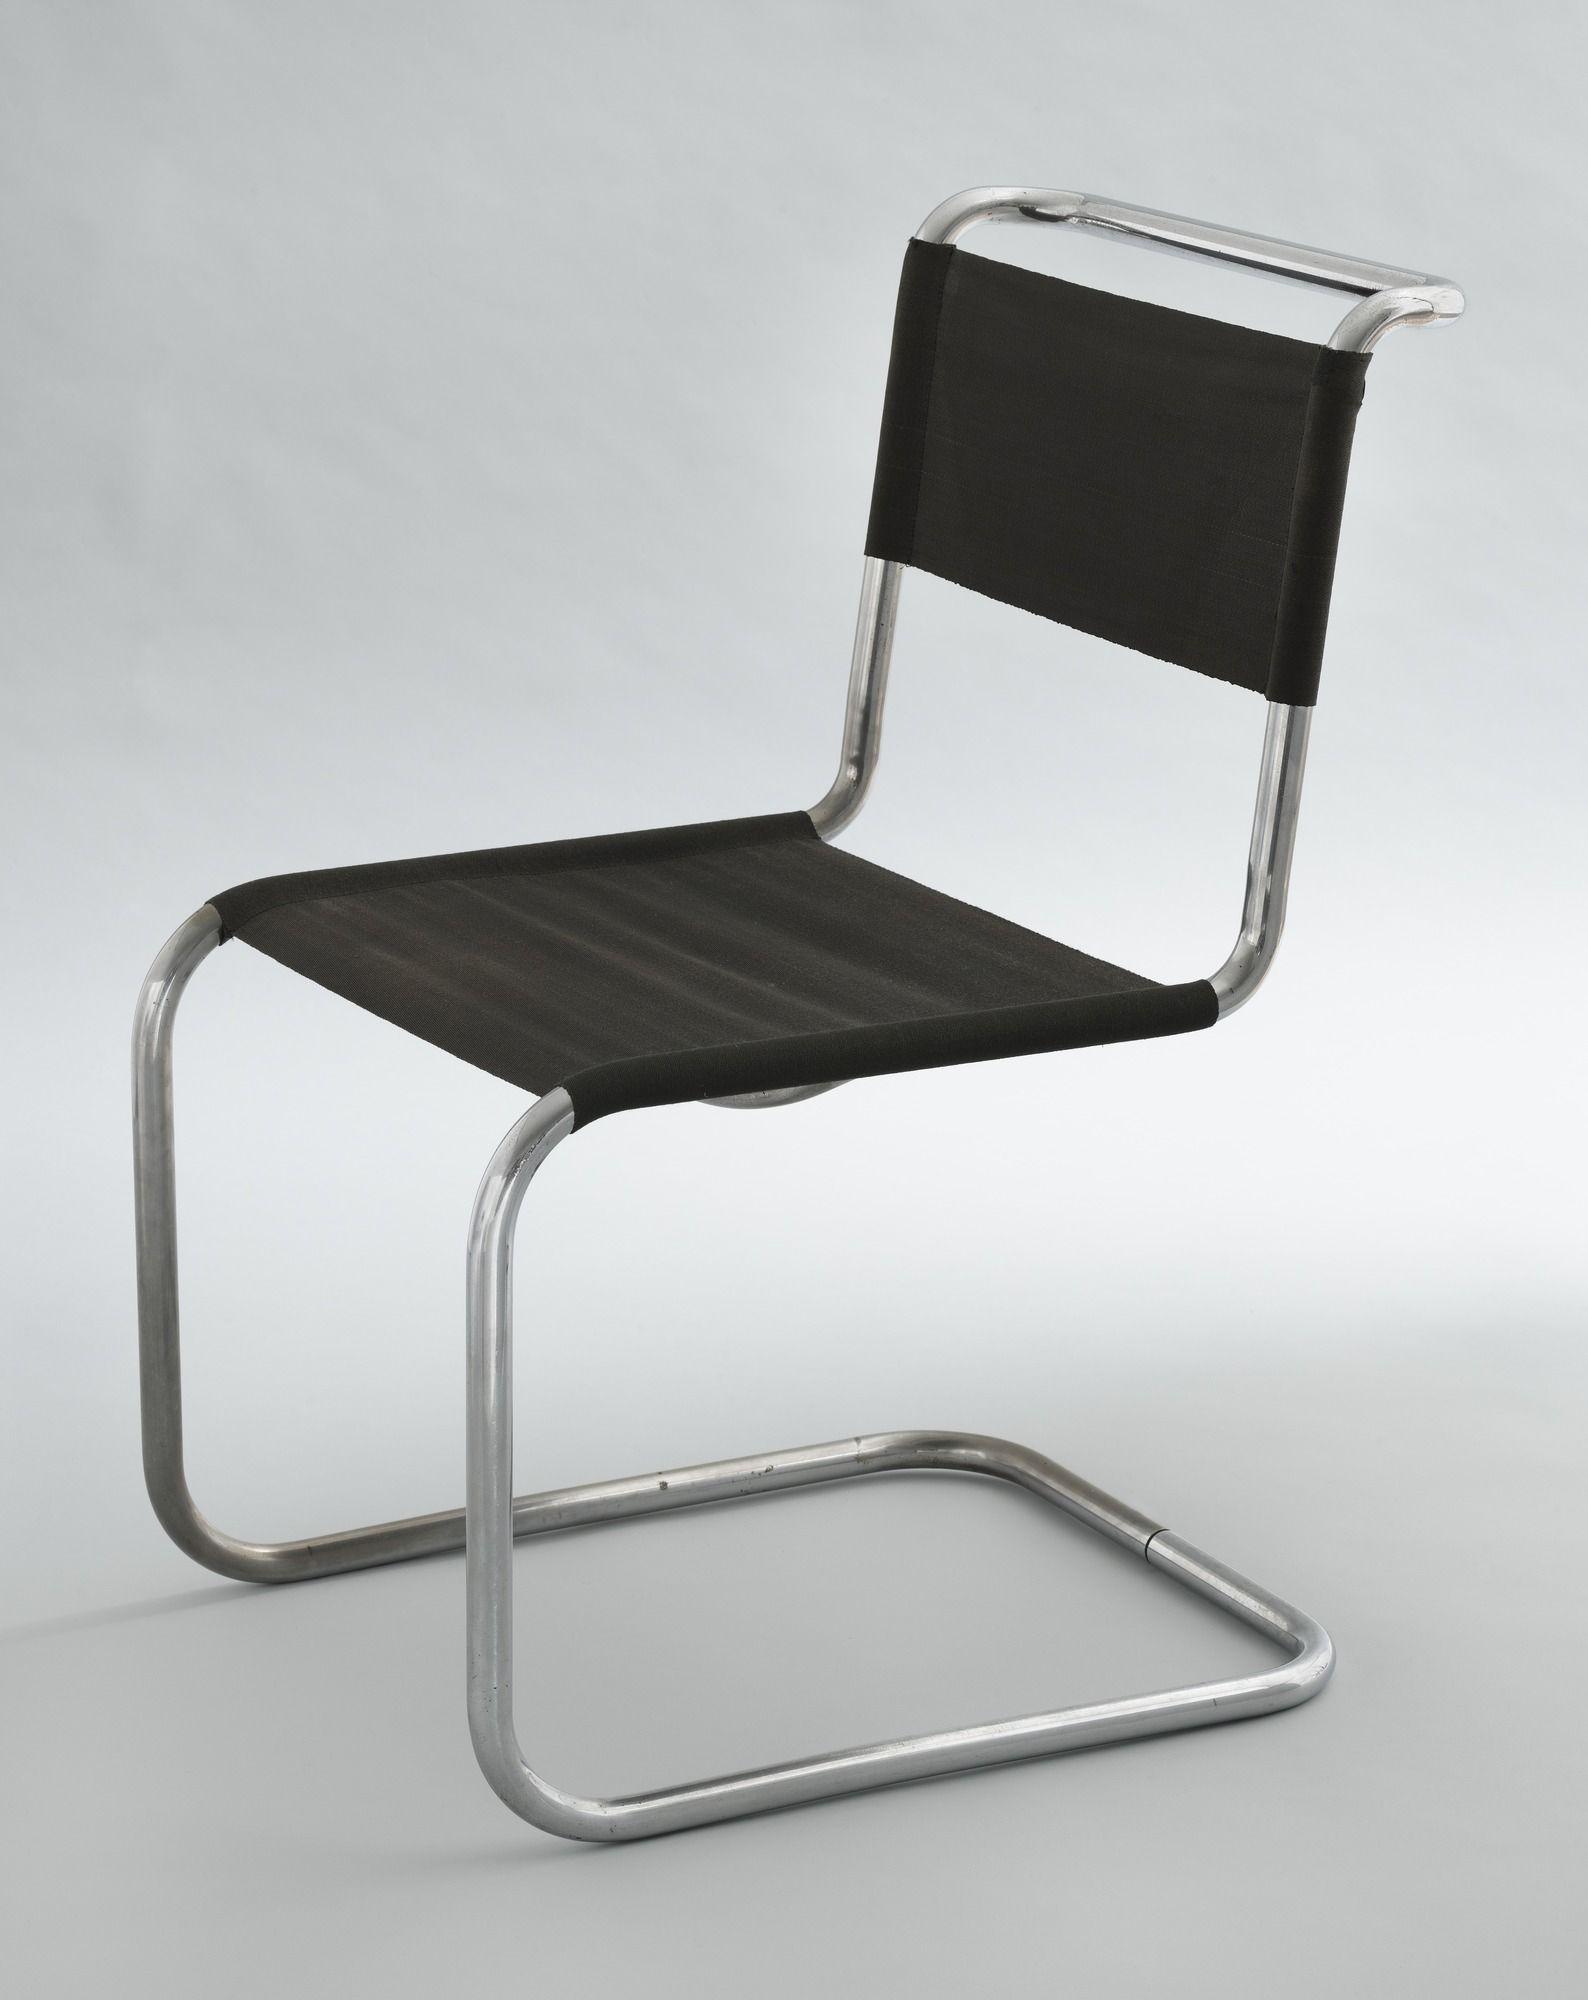 pin by maung linlin on steel pinterest marcel breuer. Black Bedroom Furniture Sets. Home Design Ideas